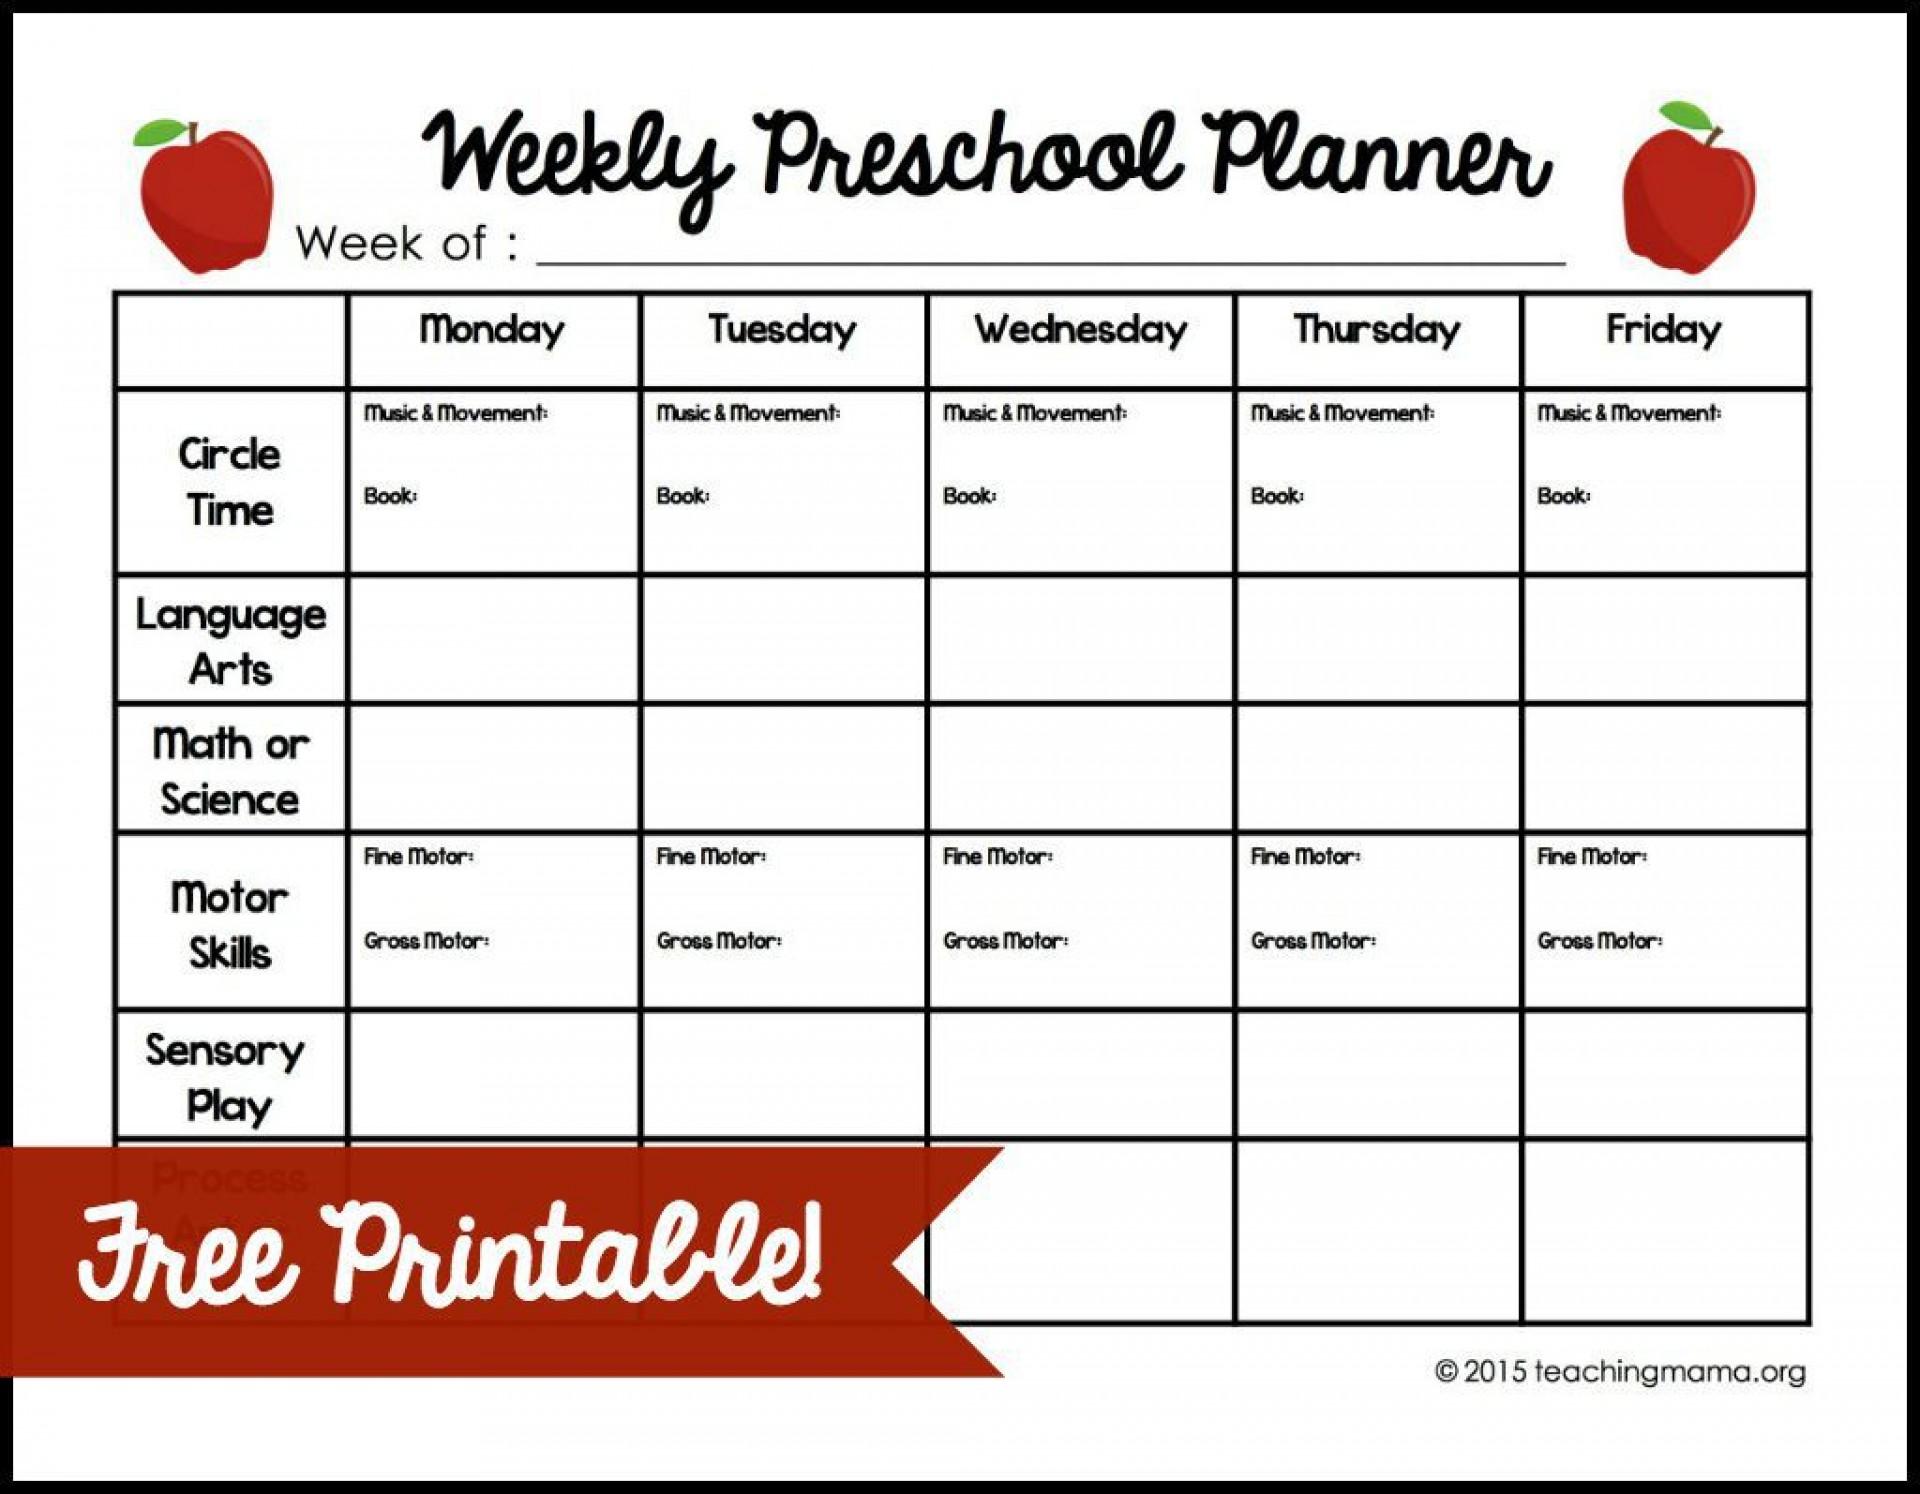 009 Fantastic Lesson Plan Template For Preschool Highest Quality  Format Teacher Free Printable1920